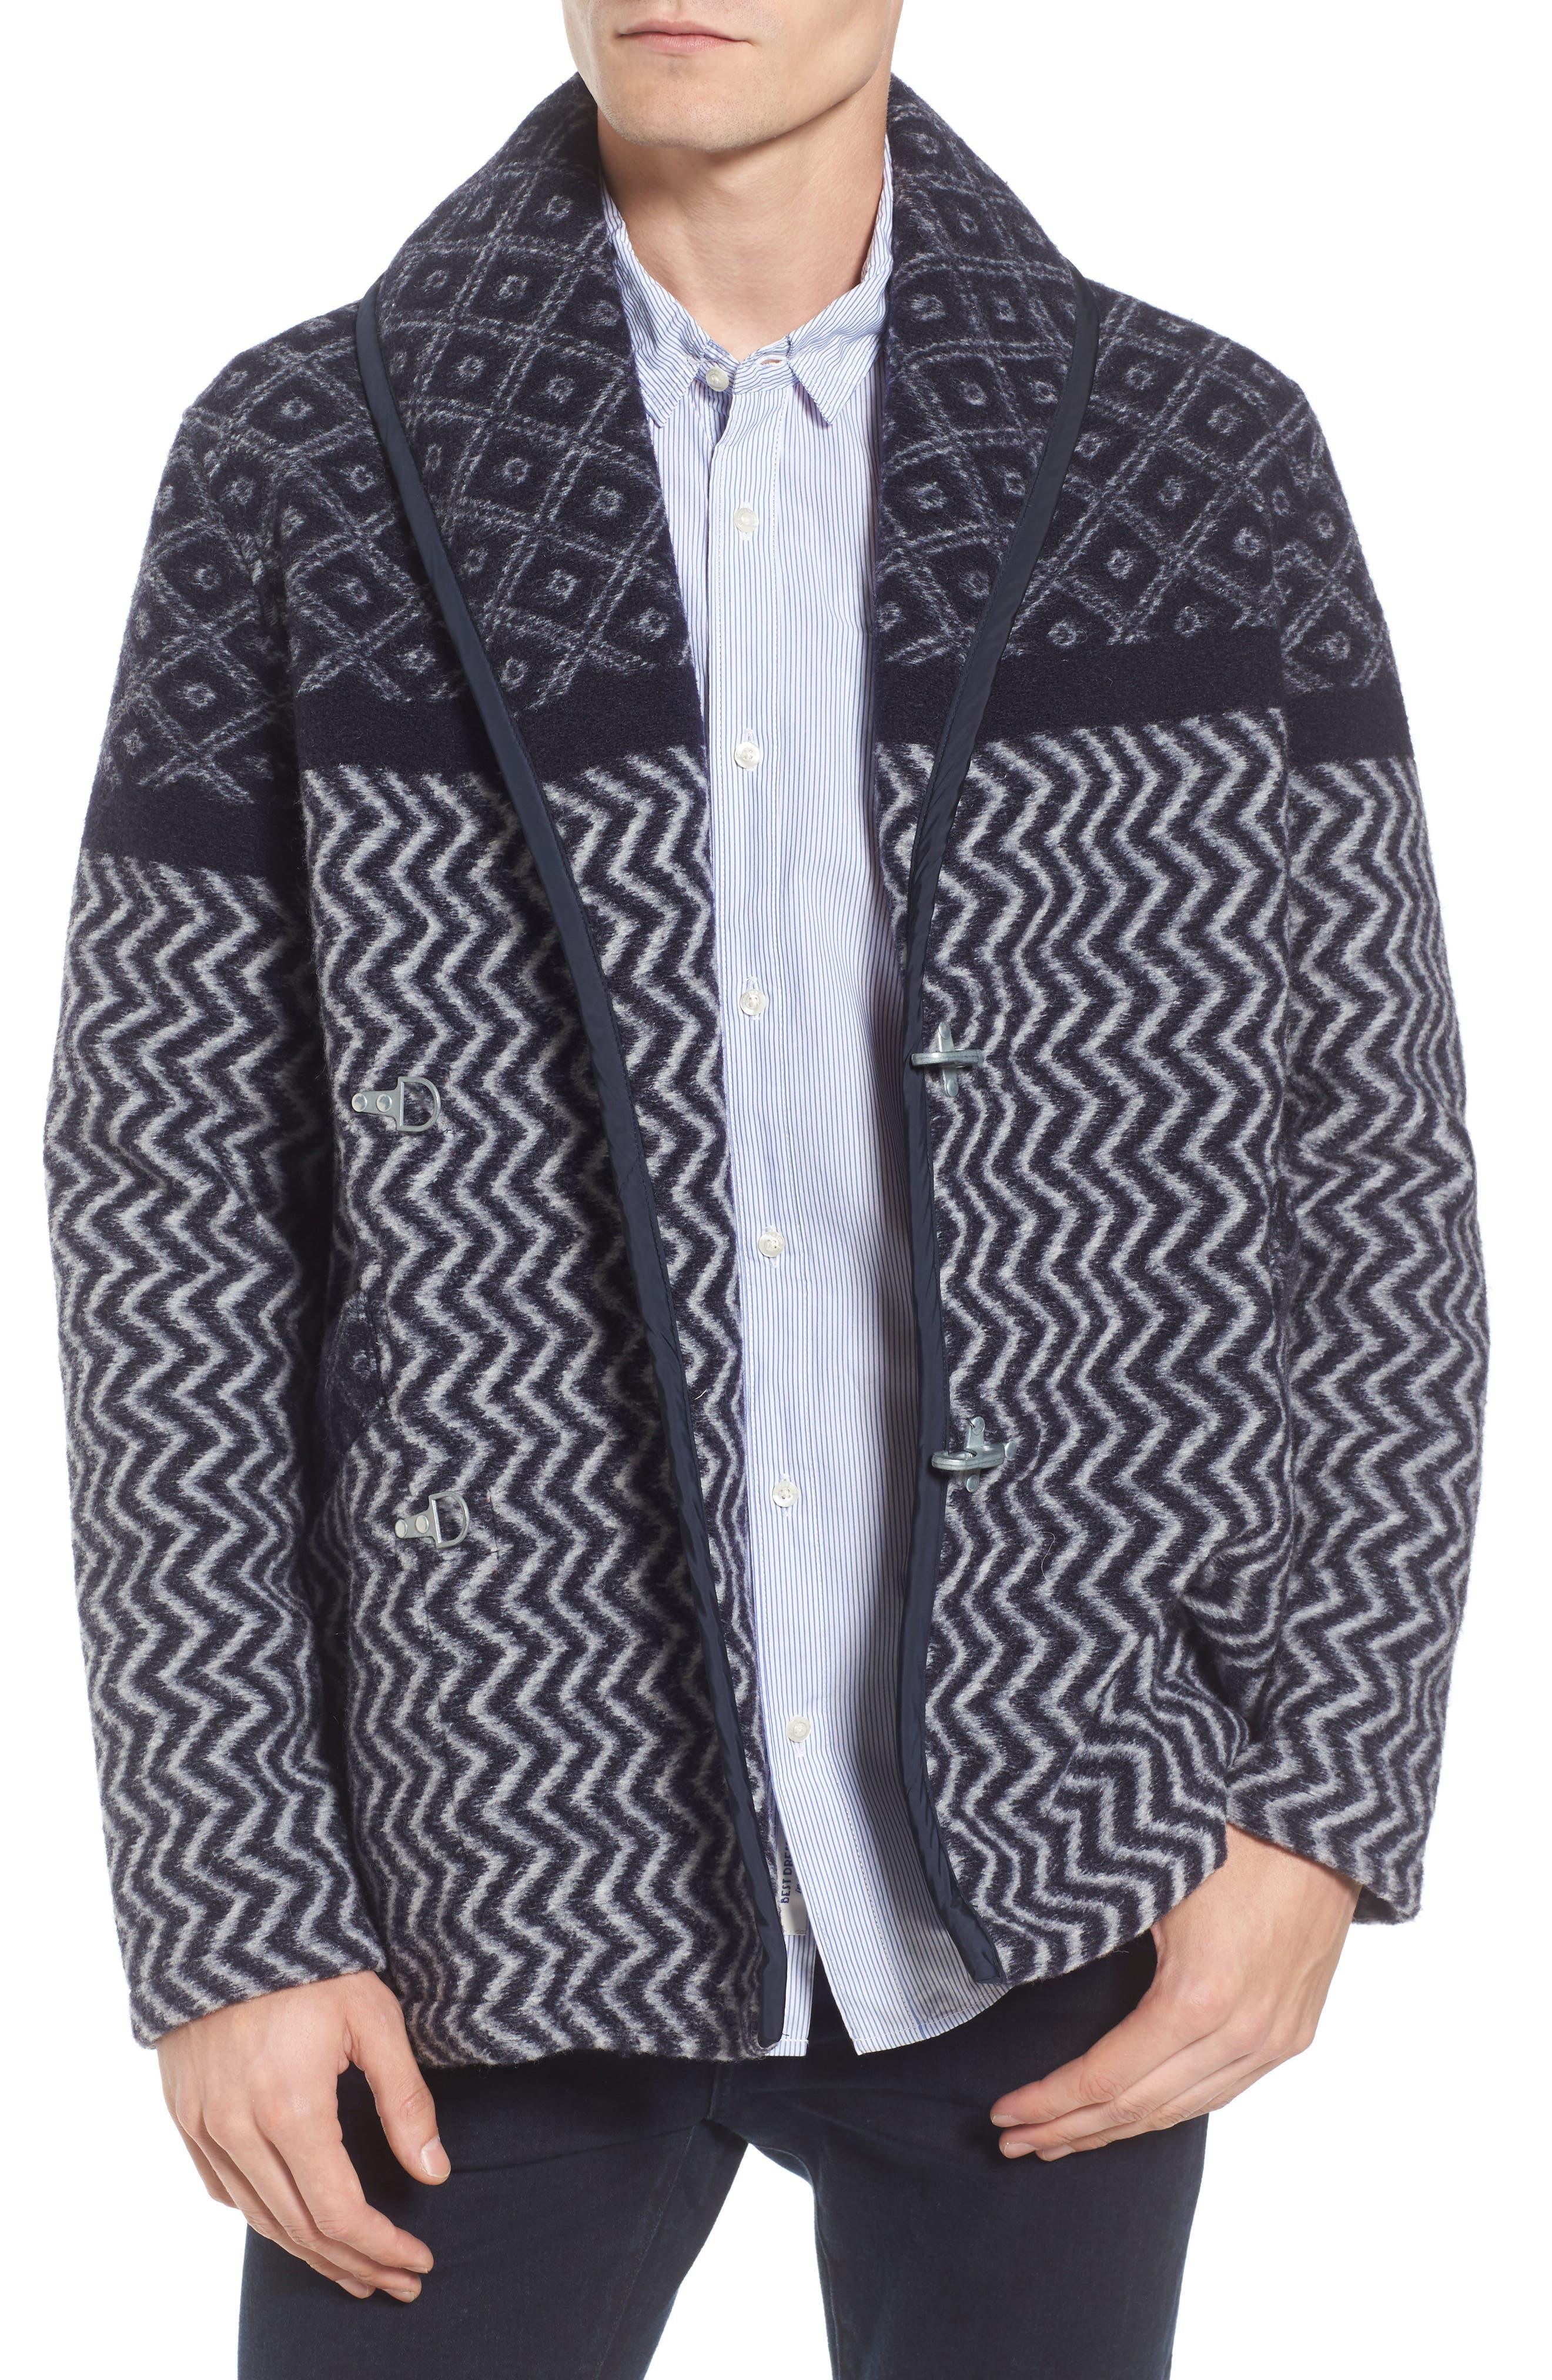 Blanket Jacket,                             Main thumbnail 1, color,                             Blue